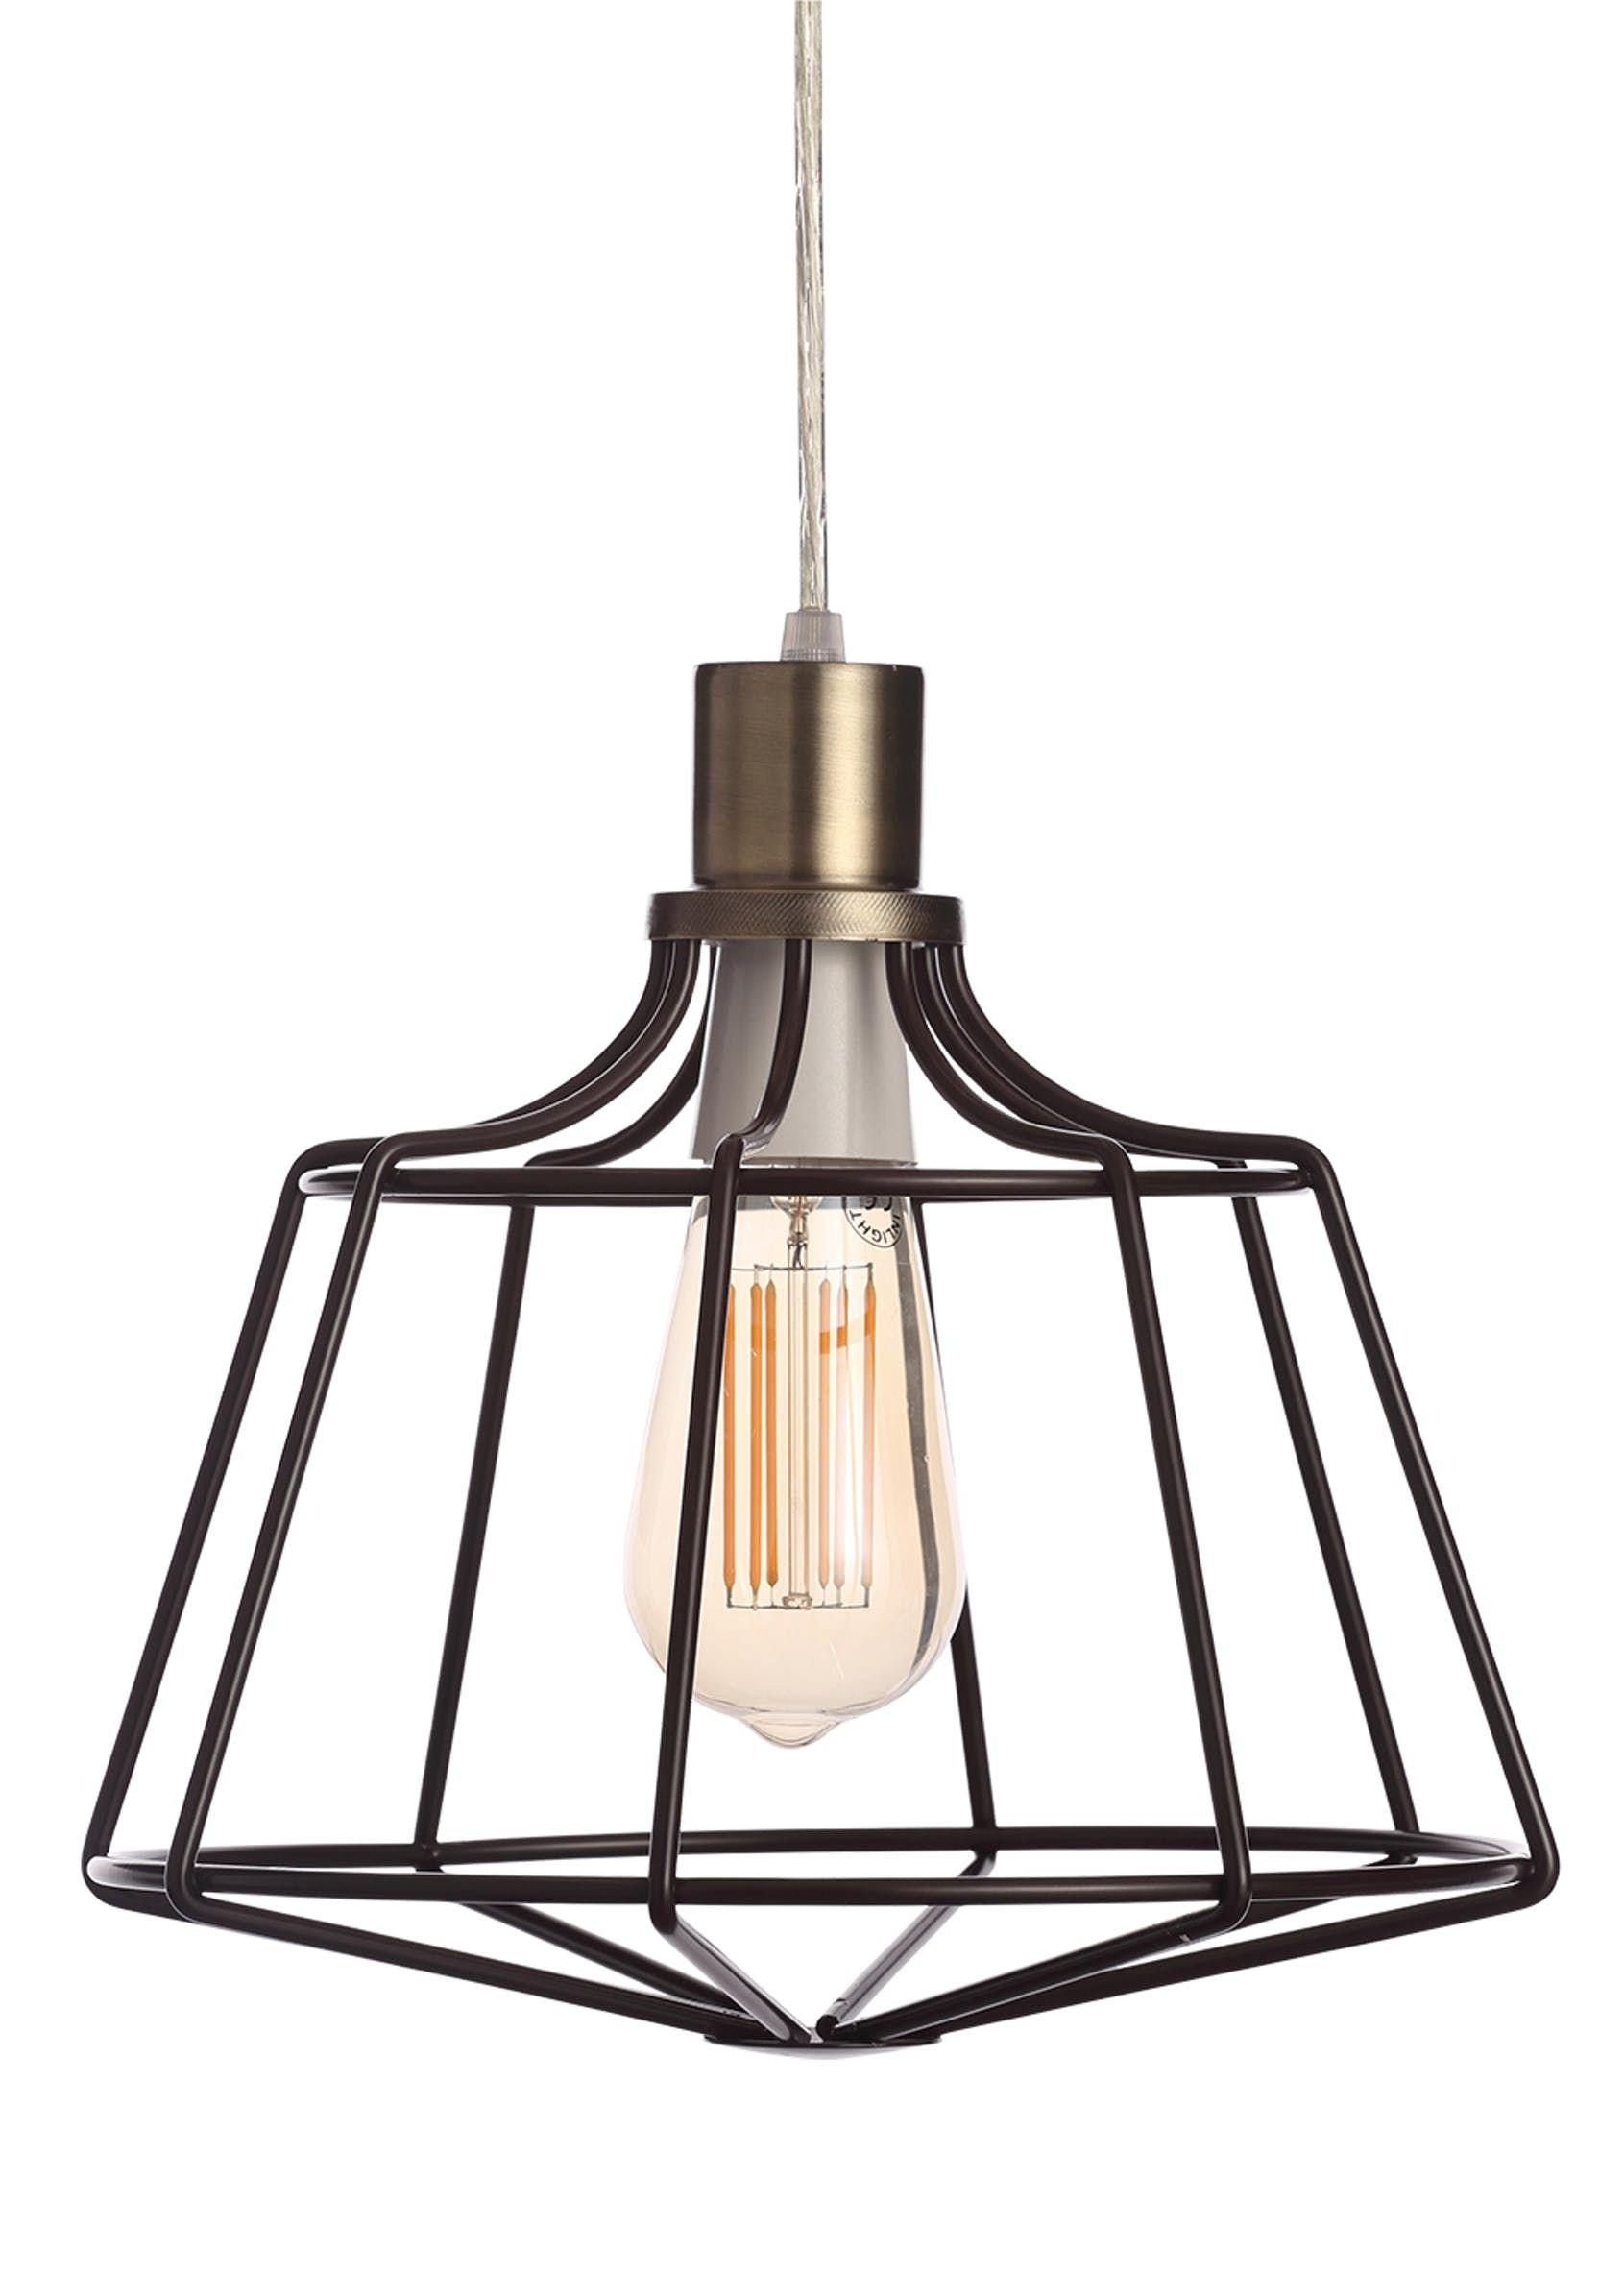 Callisto Caged Easy Fit Lamp Shade (W28cm x H25cm) Black